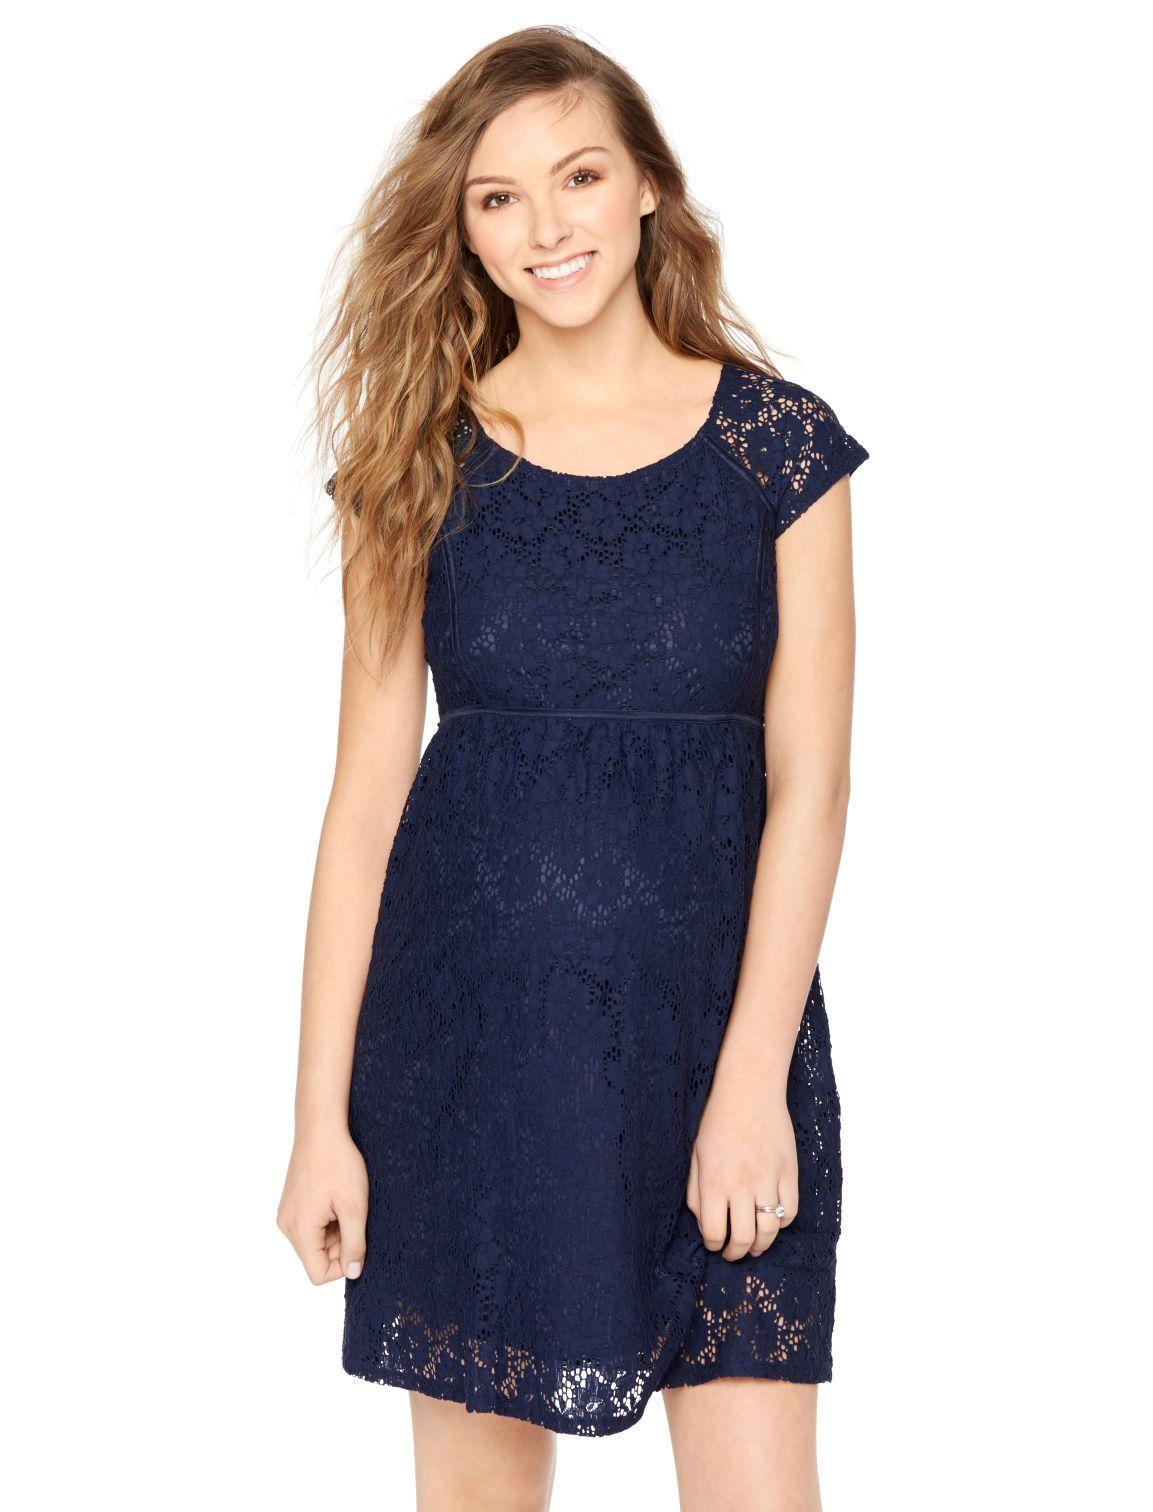 55c6615069bf4 Motherhood Maternity Short Sleeve Lace Maternity Dress | Spring + ...